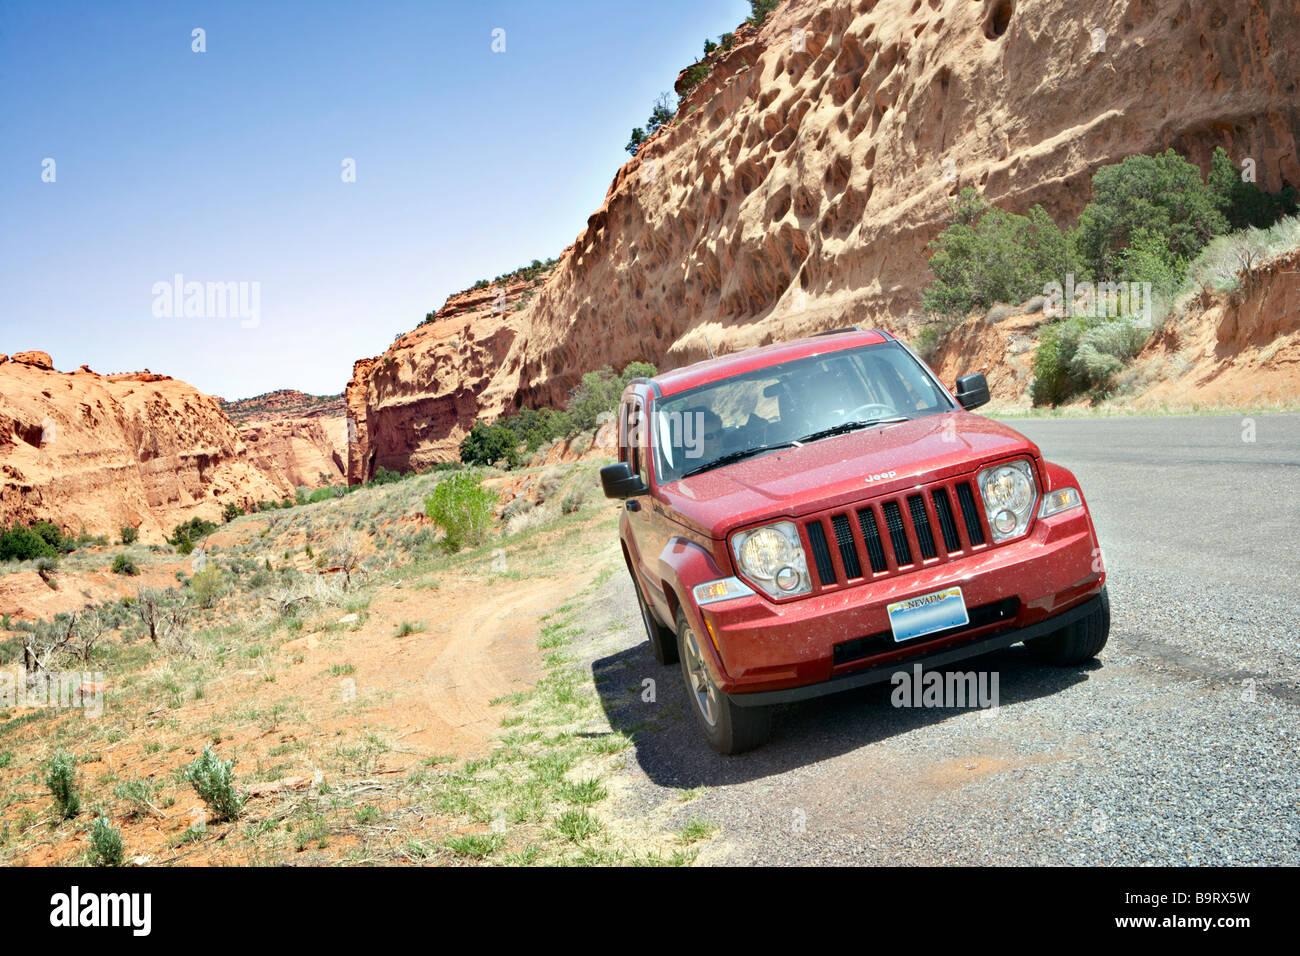 4 Wheel Drive Vehicle in Capitol Reef National Park Utah USA - Stock Image